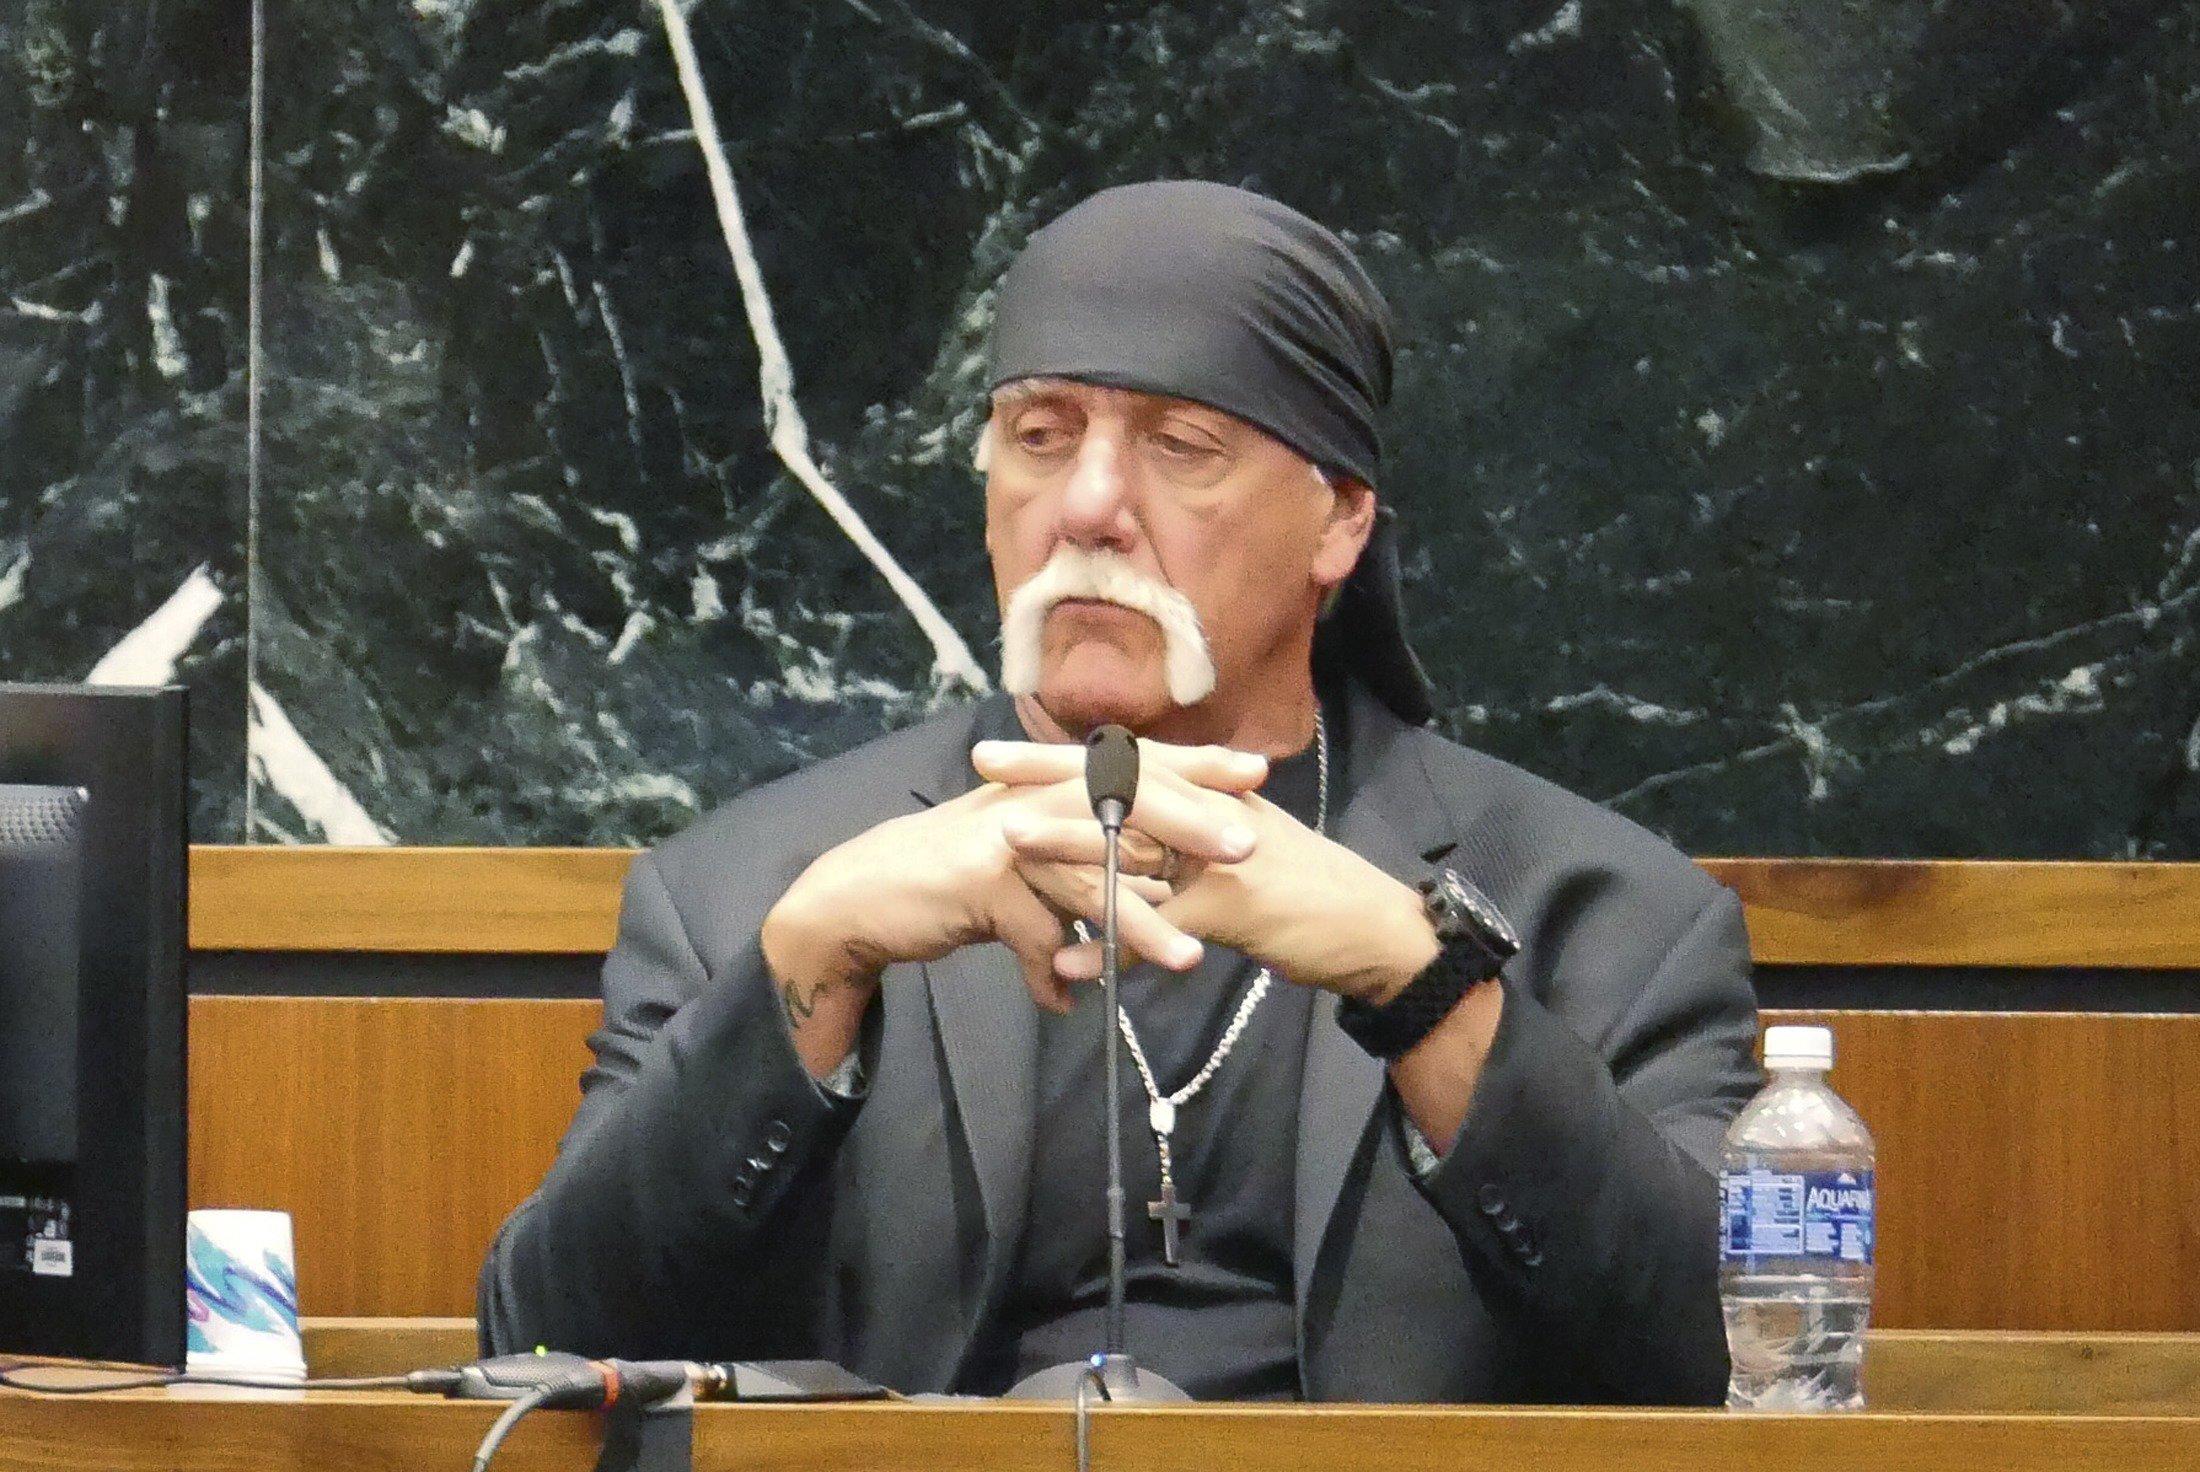 Hulk Hogan seeking $100 million for sex tape leak case